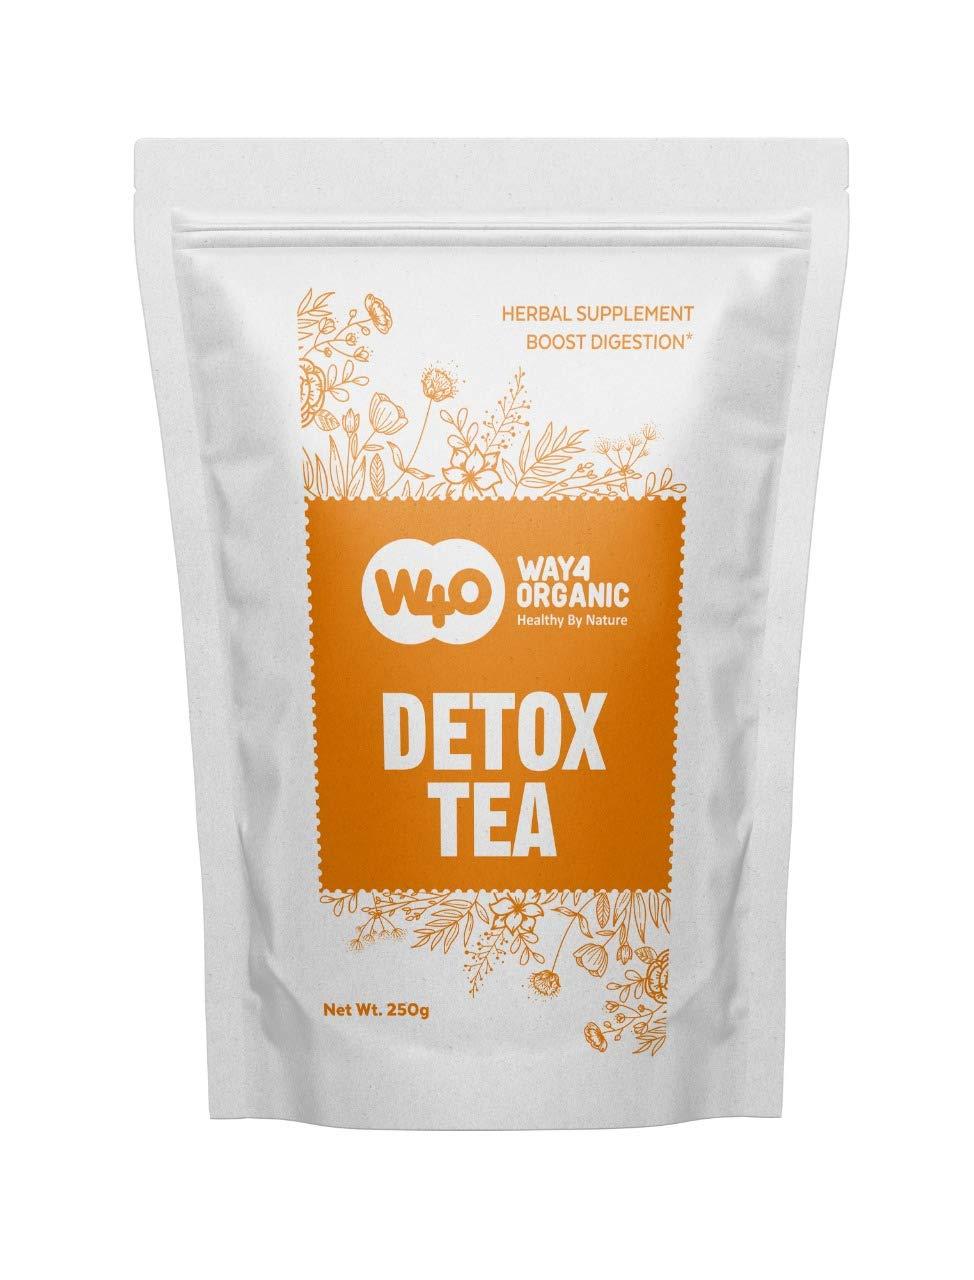 Way4Organic Detox Smooth Digestive Tea